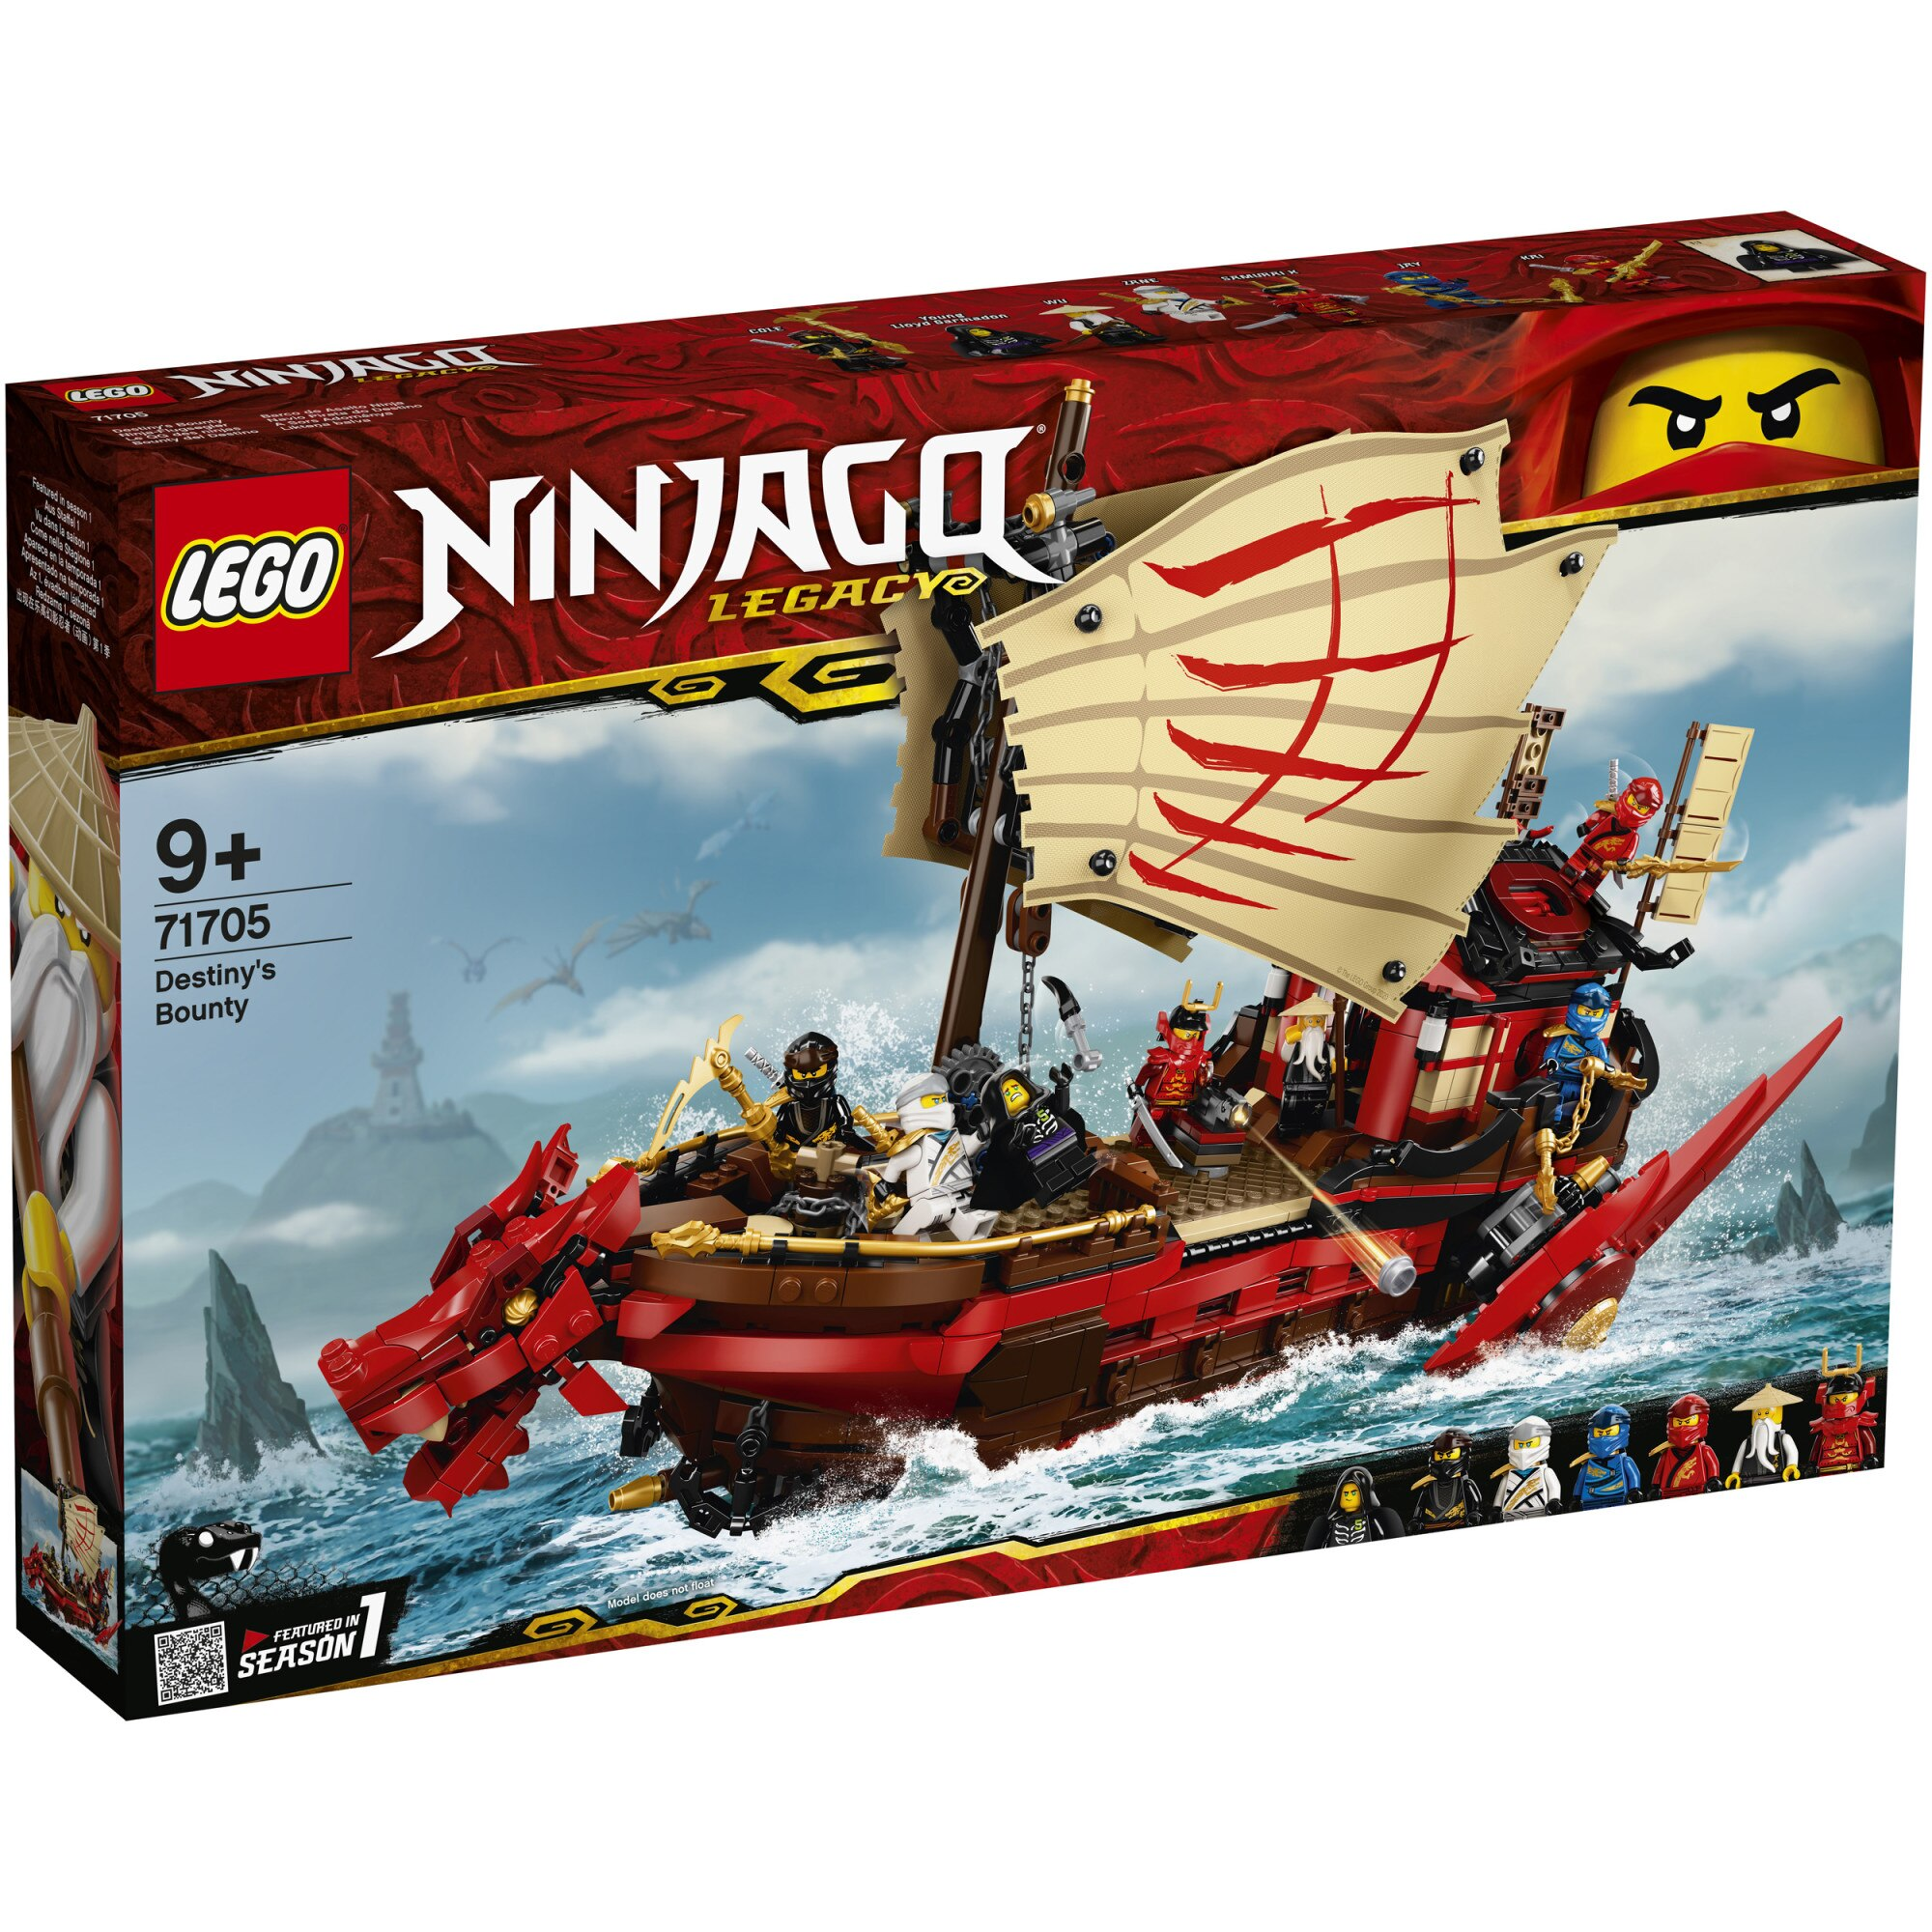 Fotografie LEGO NINJAGO - Destiny's Bounty 71705, 1781 piese